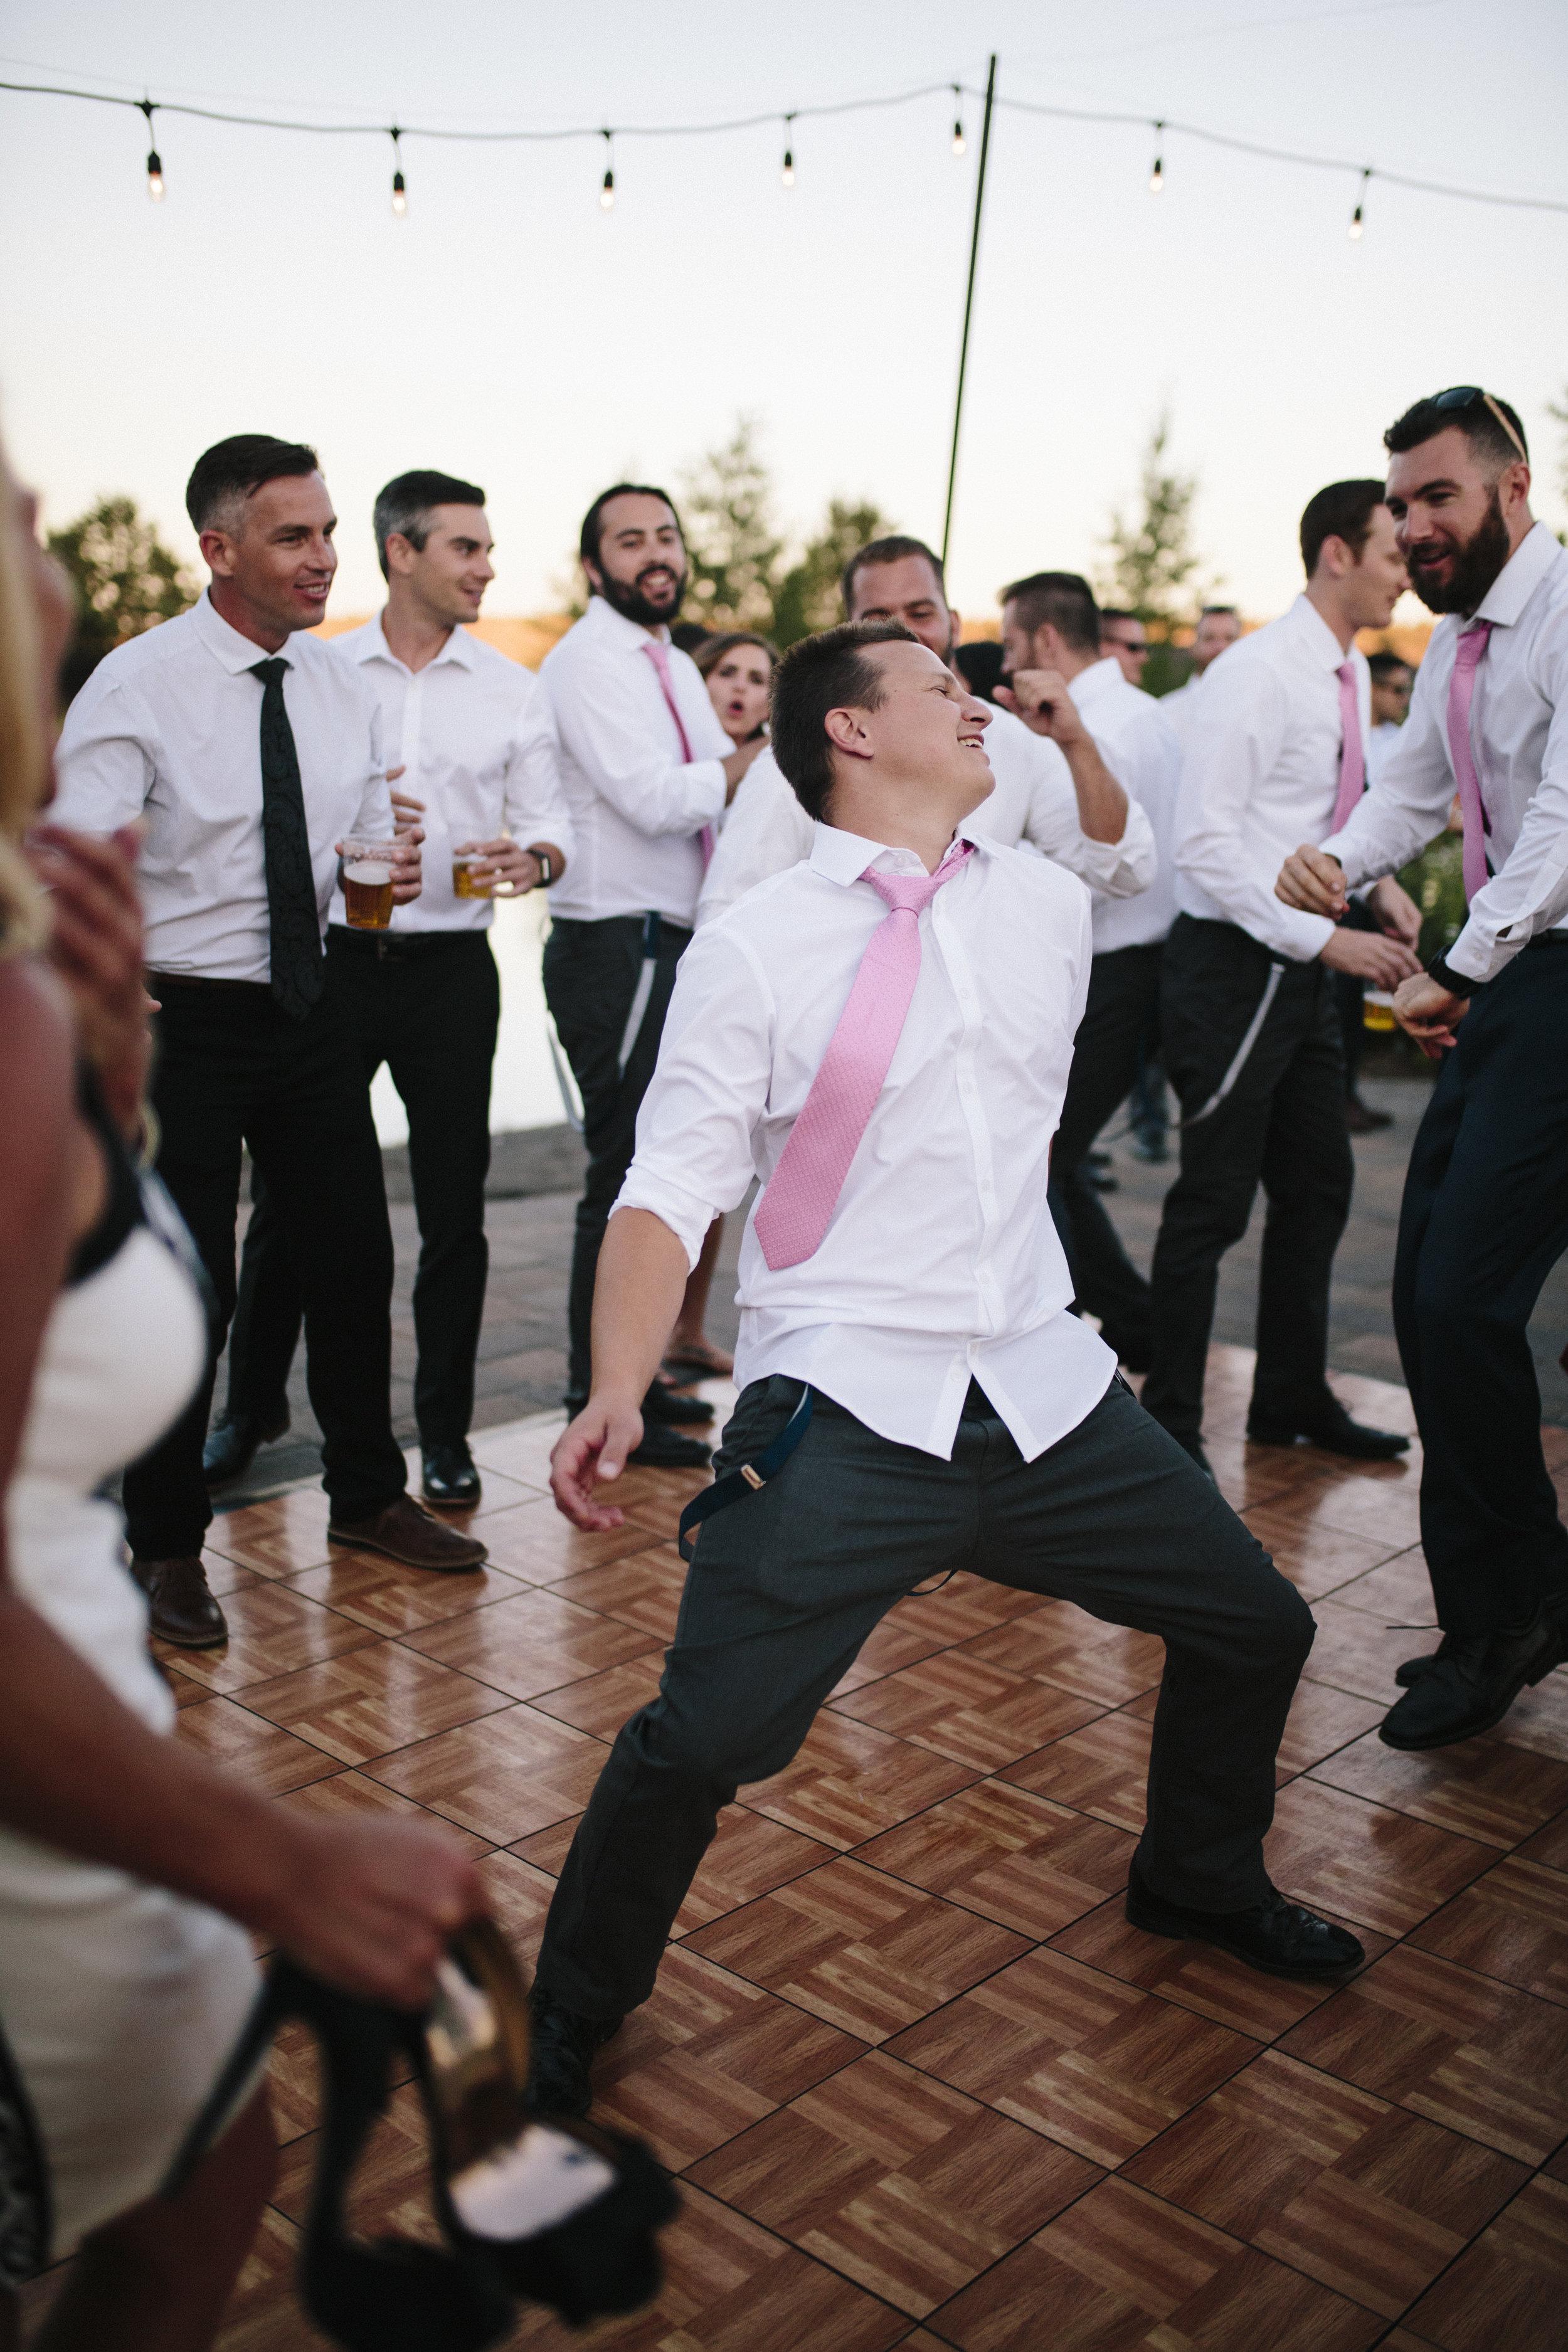 Bend-OR-Wedding-Photographer-26.jpg